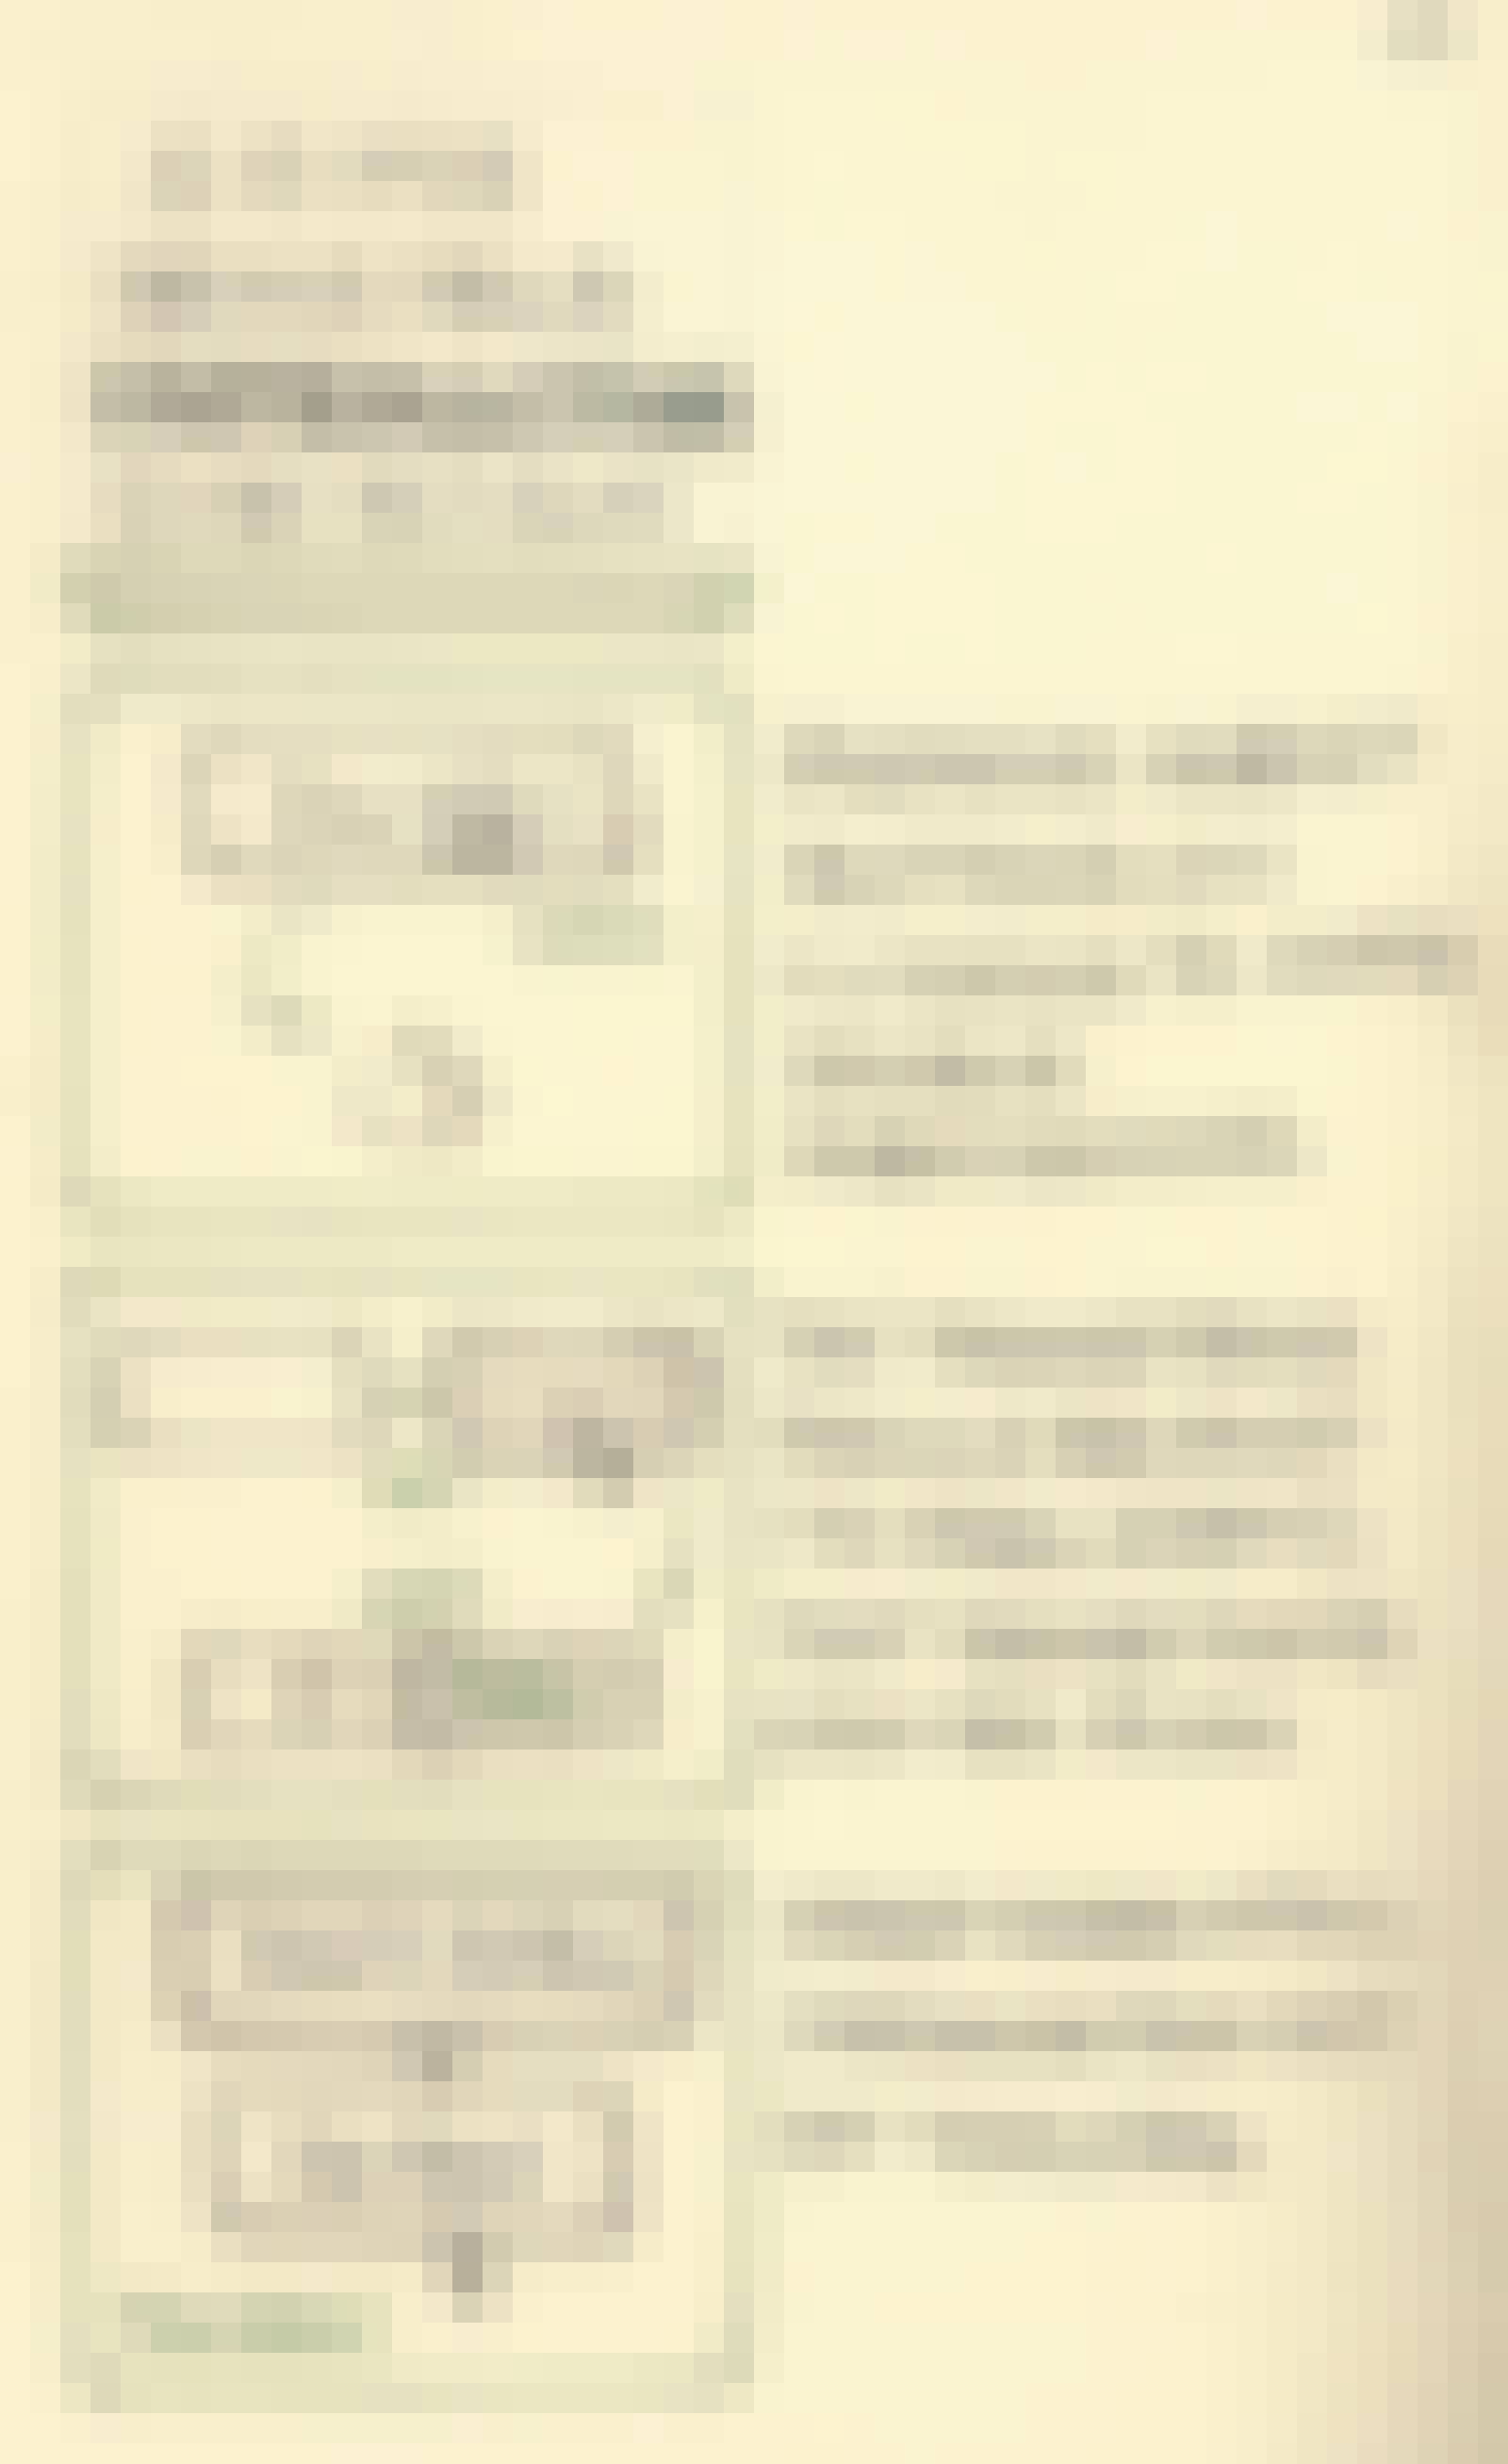 Some sensible interaction design - Sketchplanations